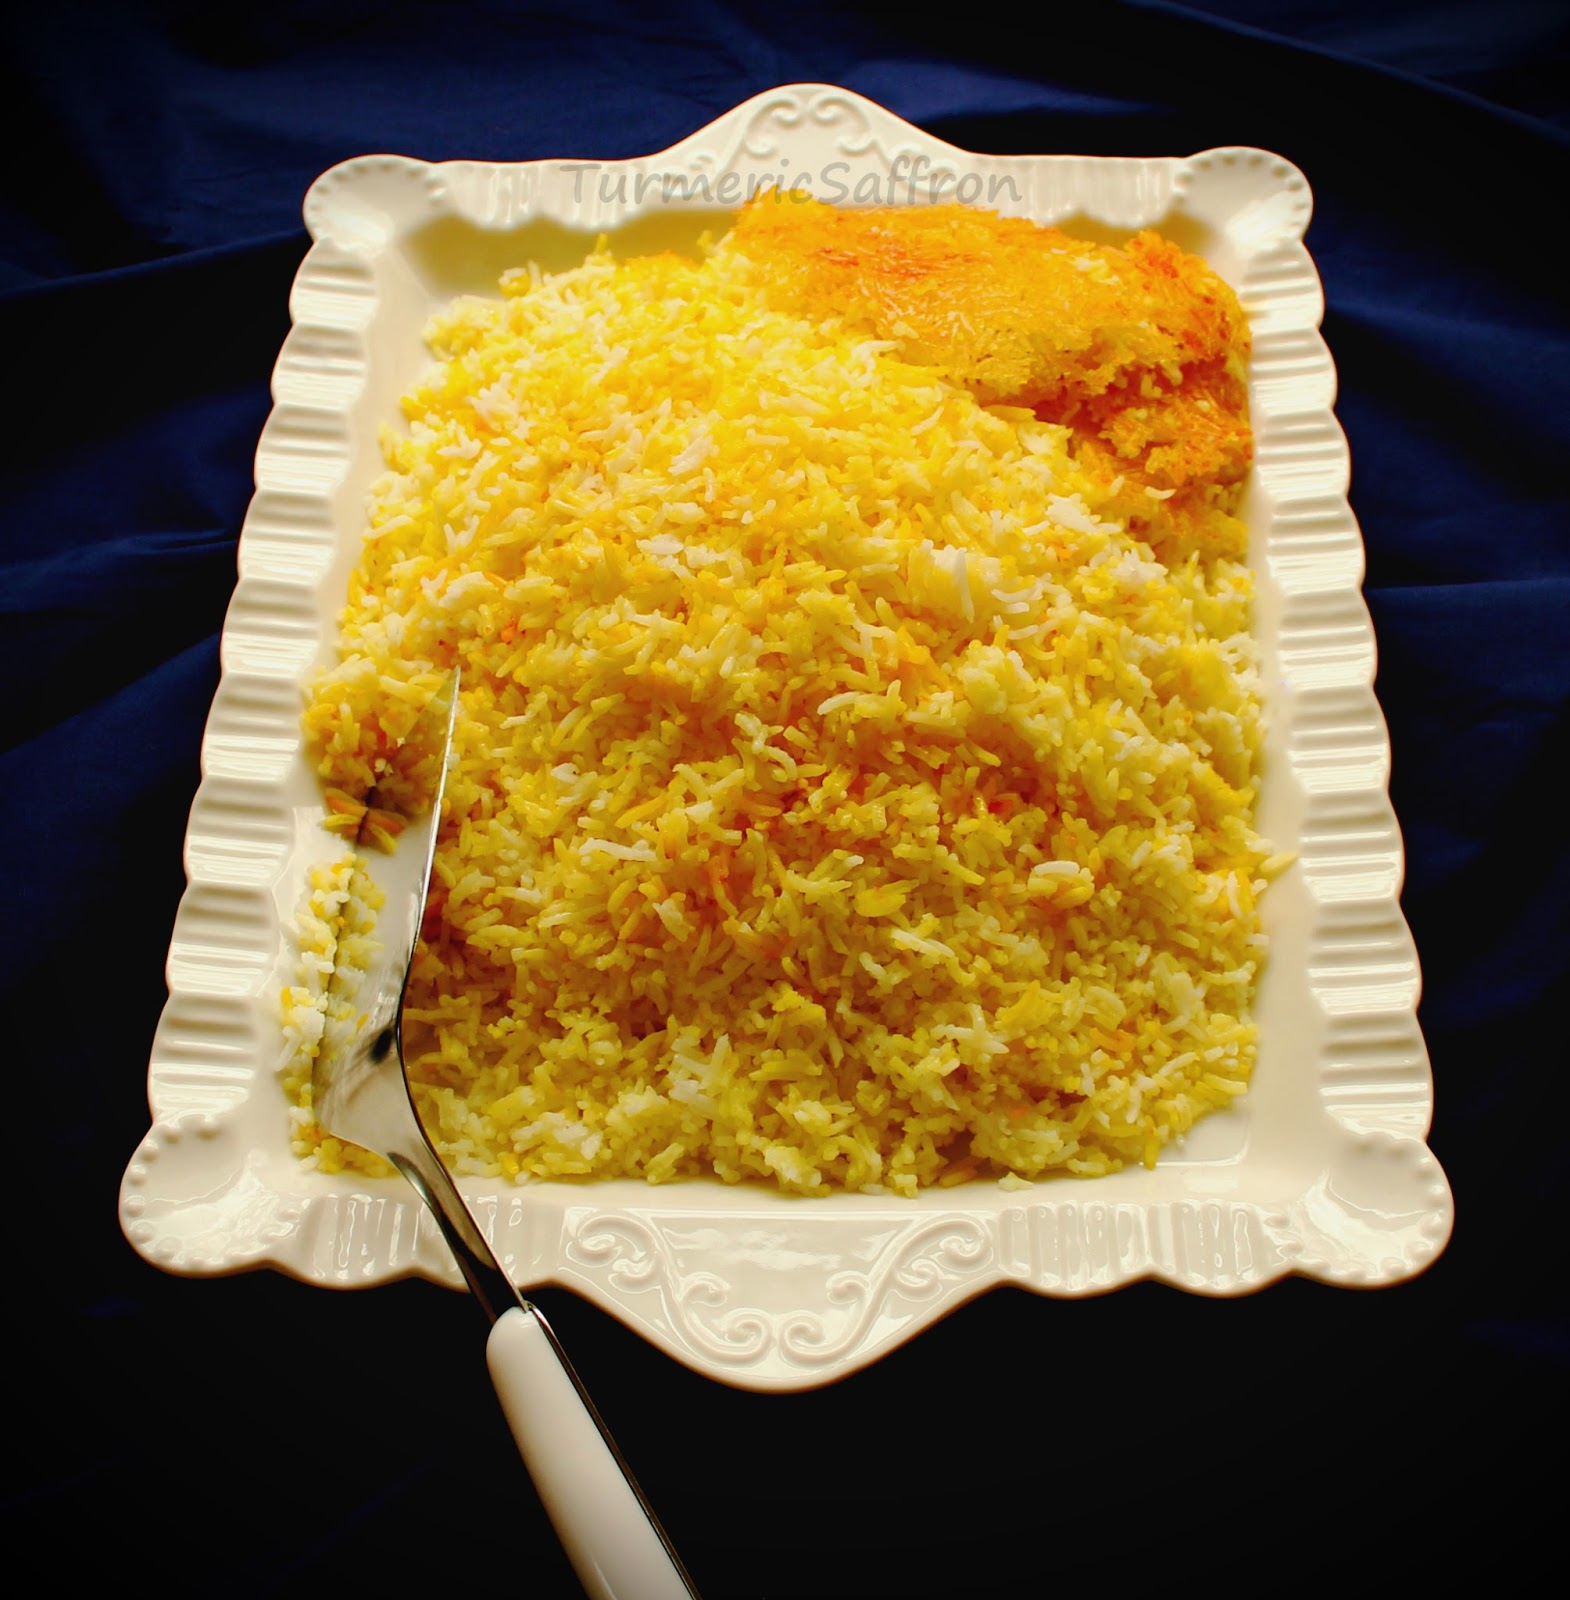 Iranian-Style Saffron Rice